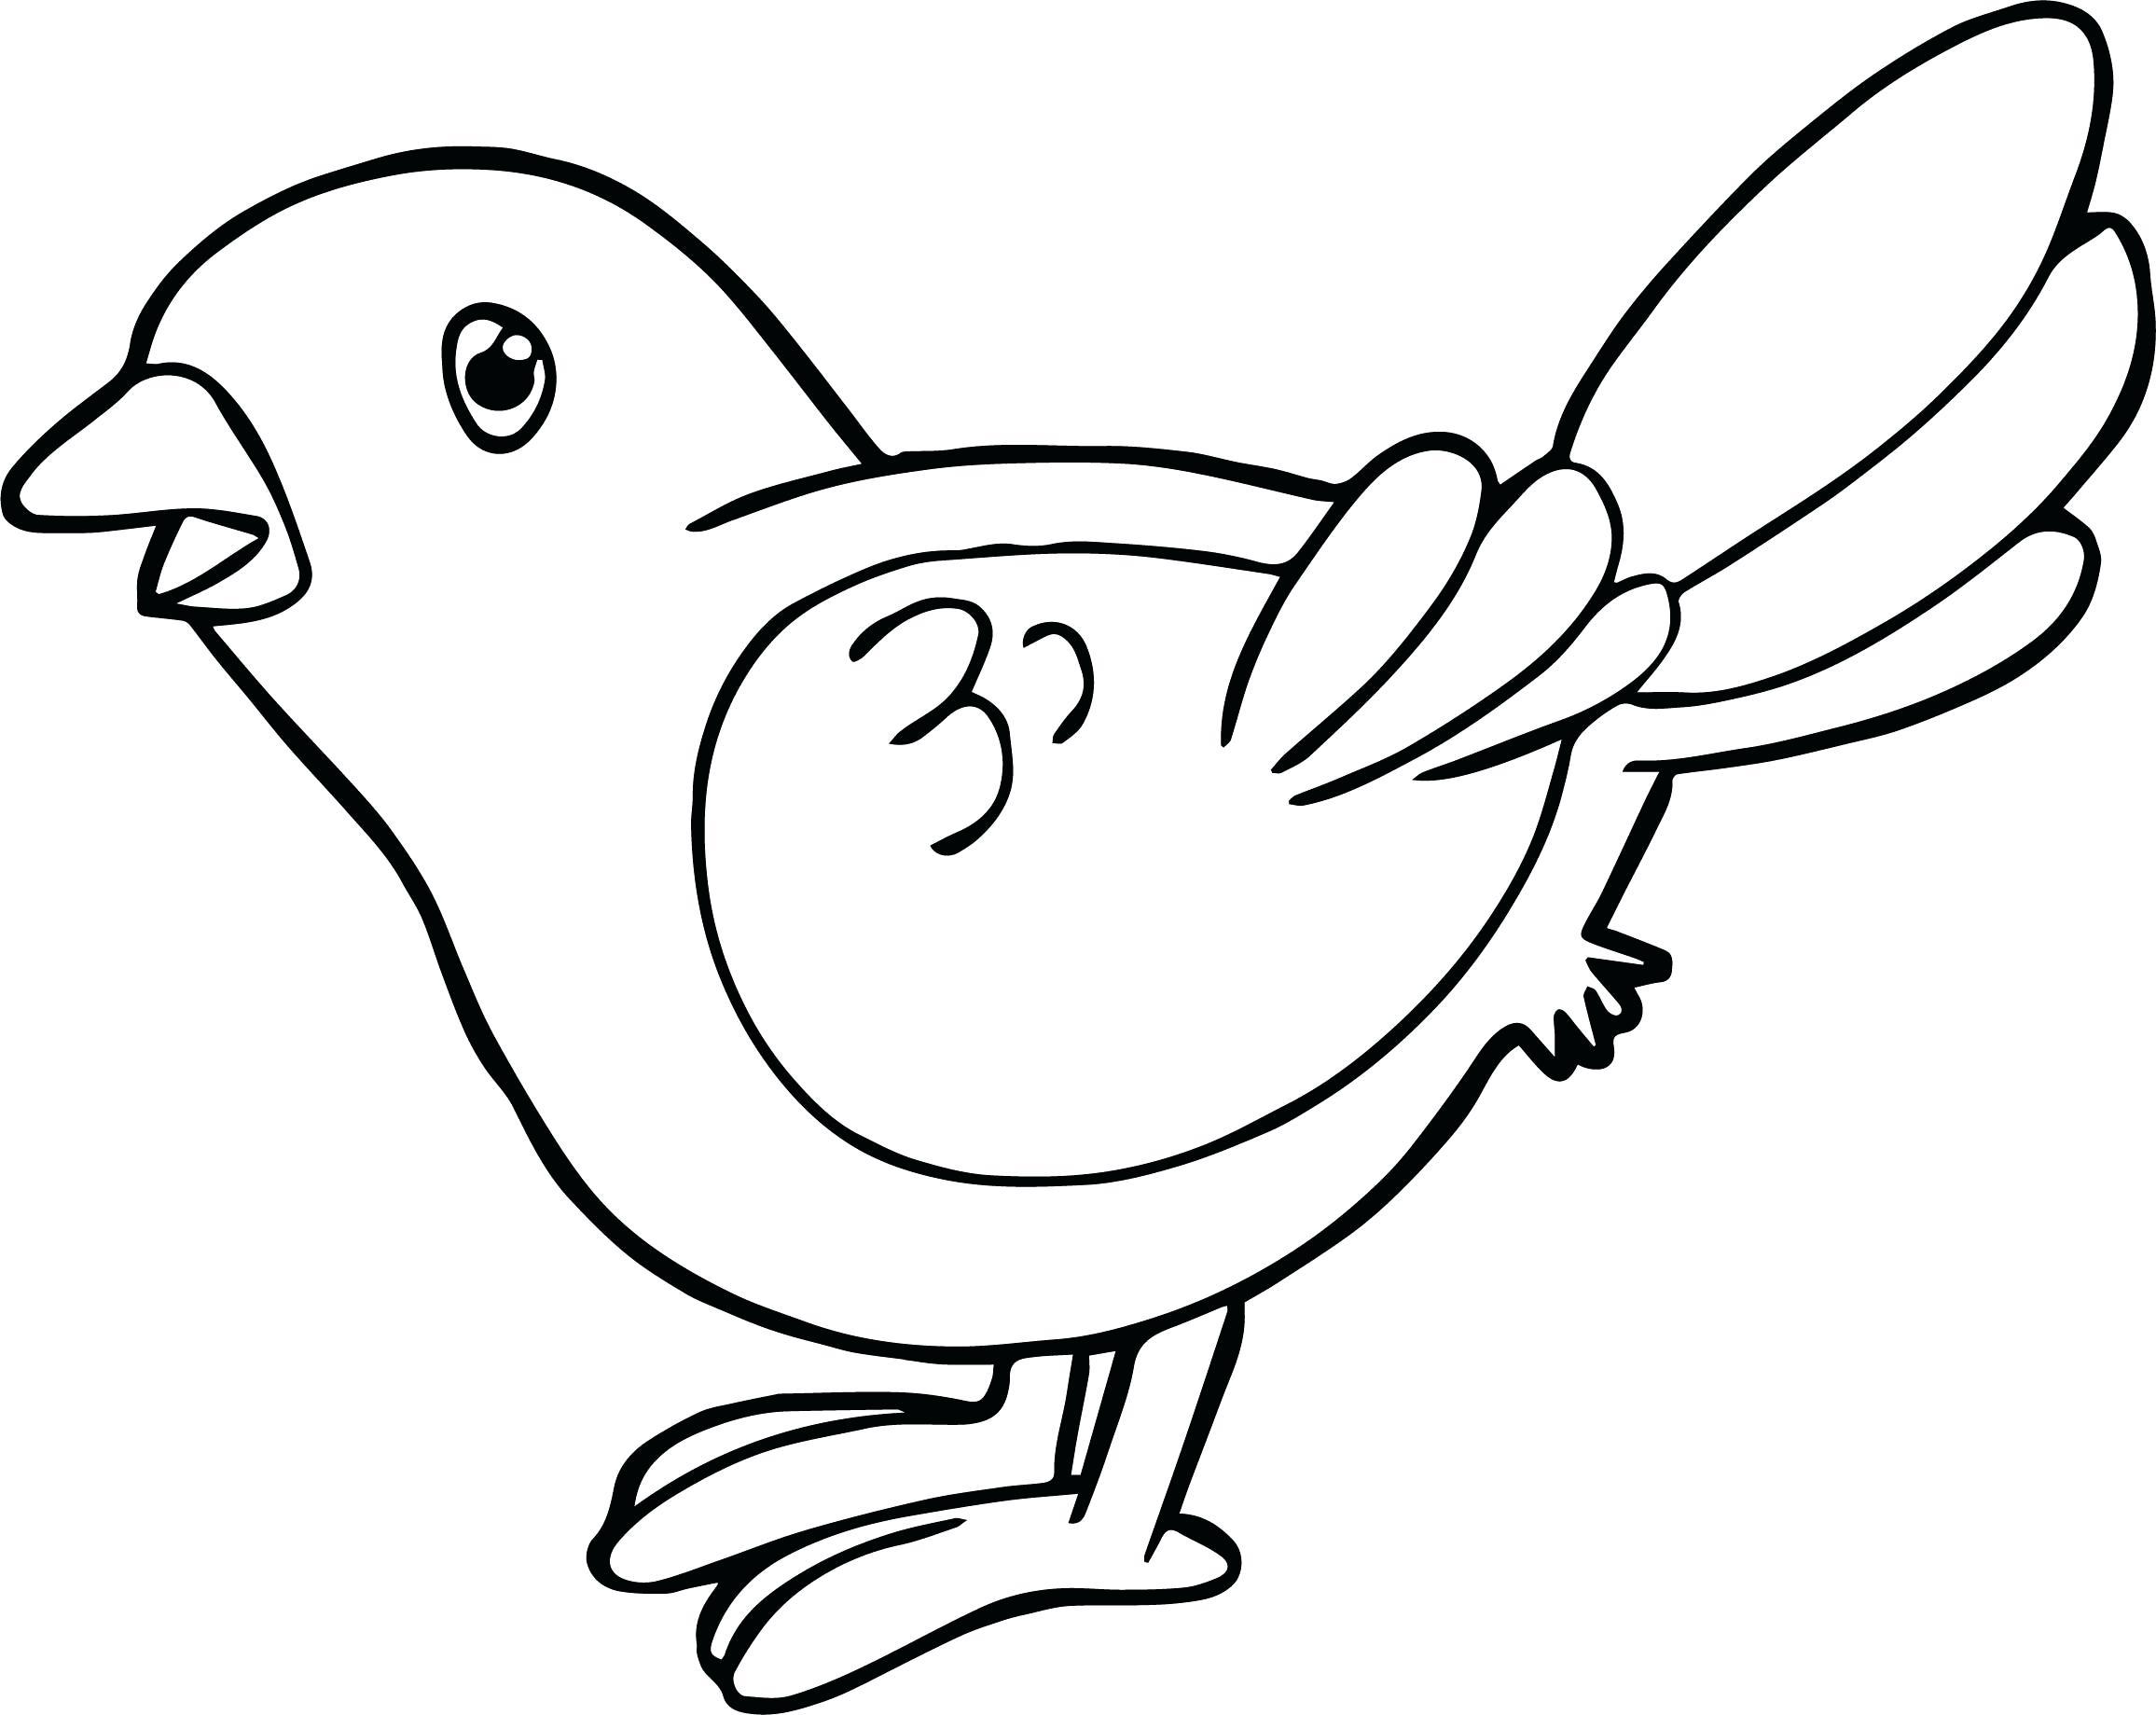 2312x1839 Eagle Bird Coloring Book For Adults Vector Illustration Anti Dodo